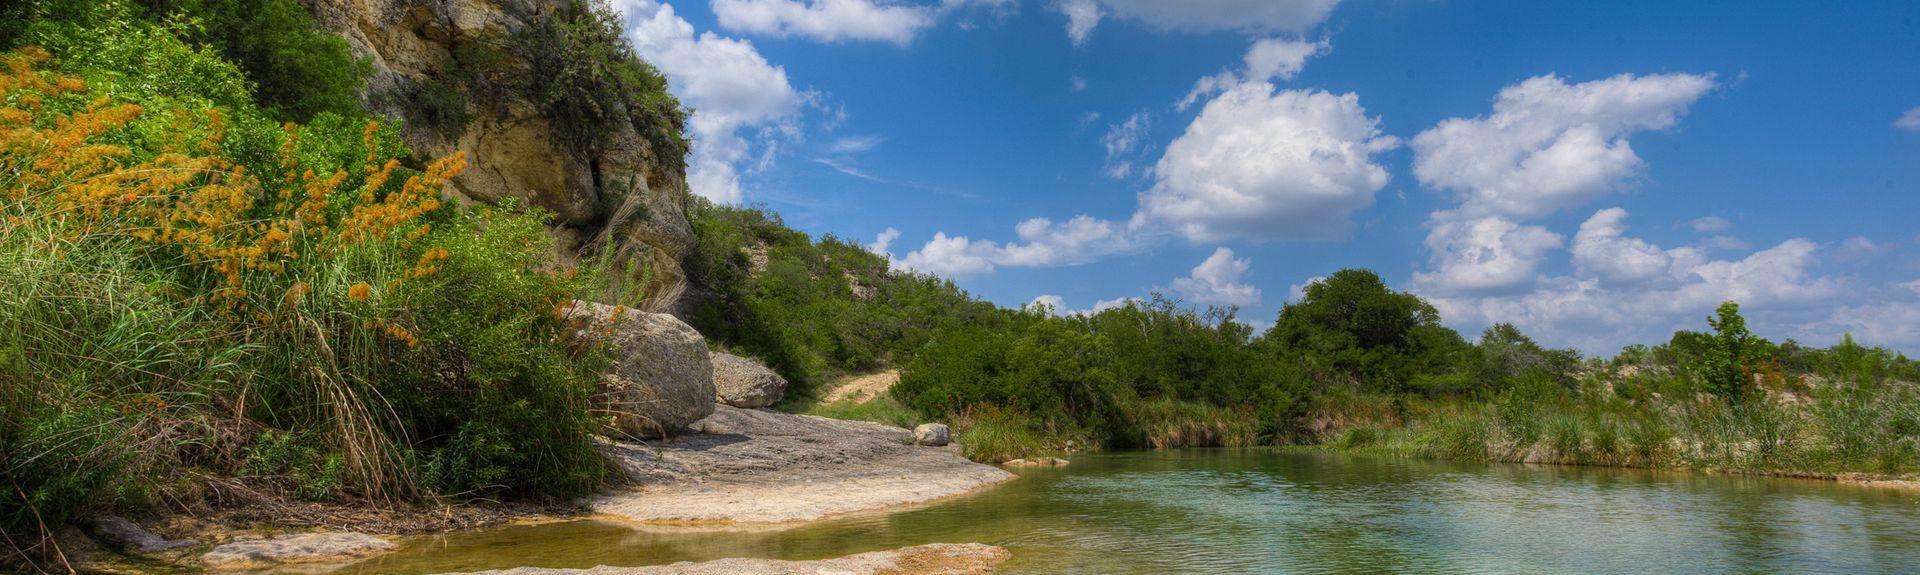 Uvalde County, TX, USA